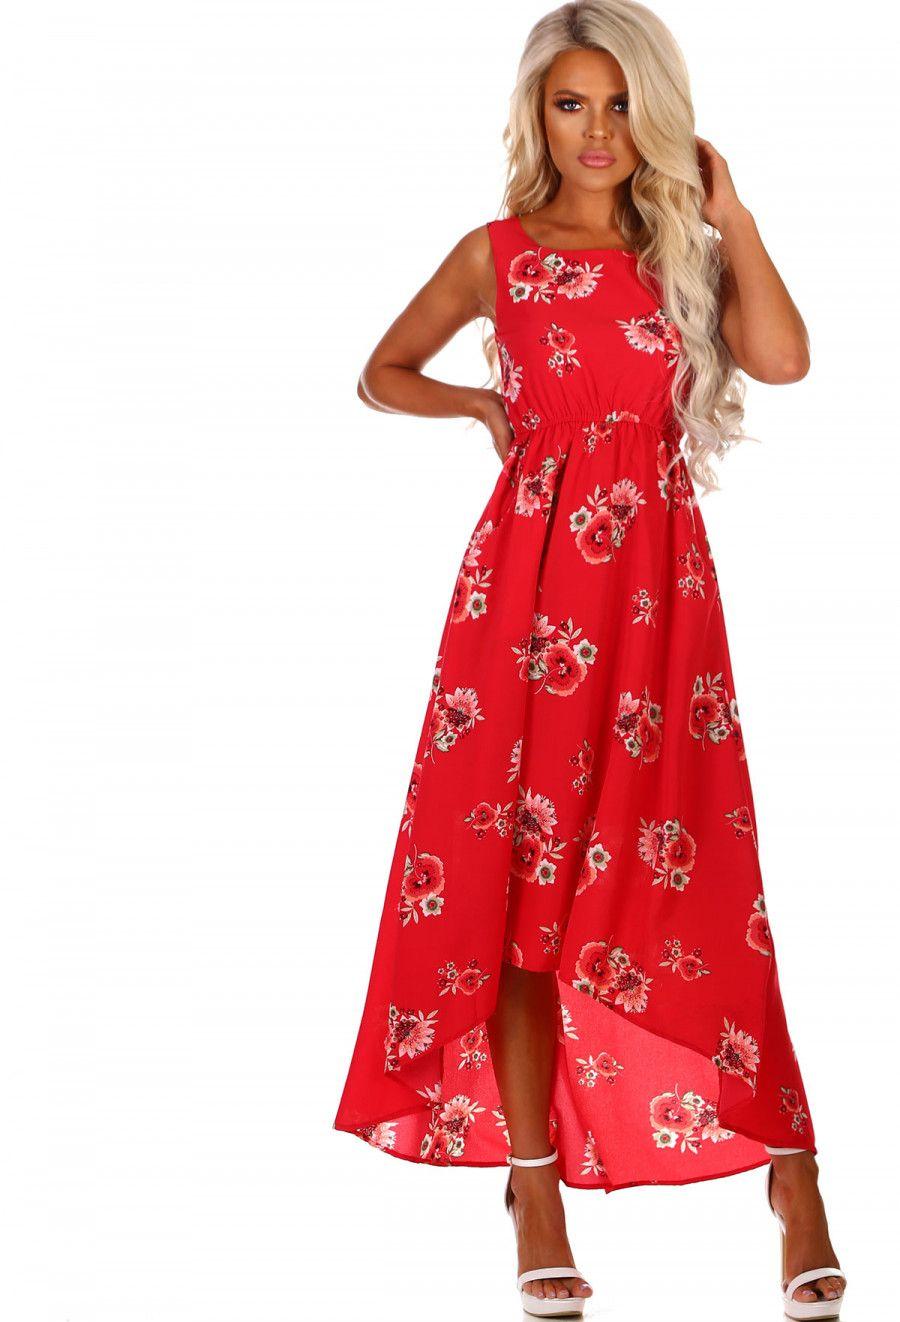 b1a72a8eae Pool Party Hun Red Floral Dip Hem Maxi Dress - 8